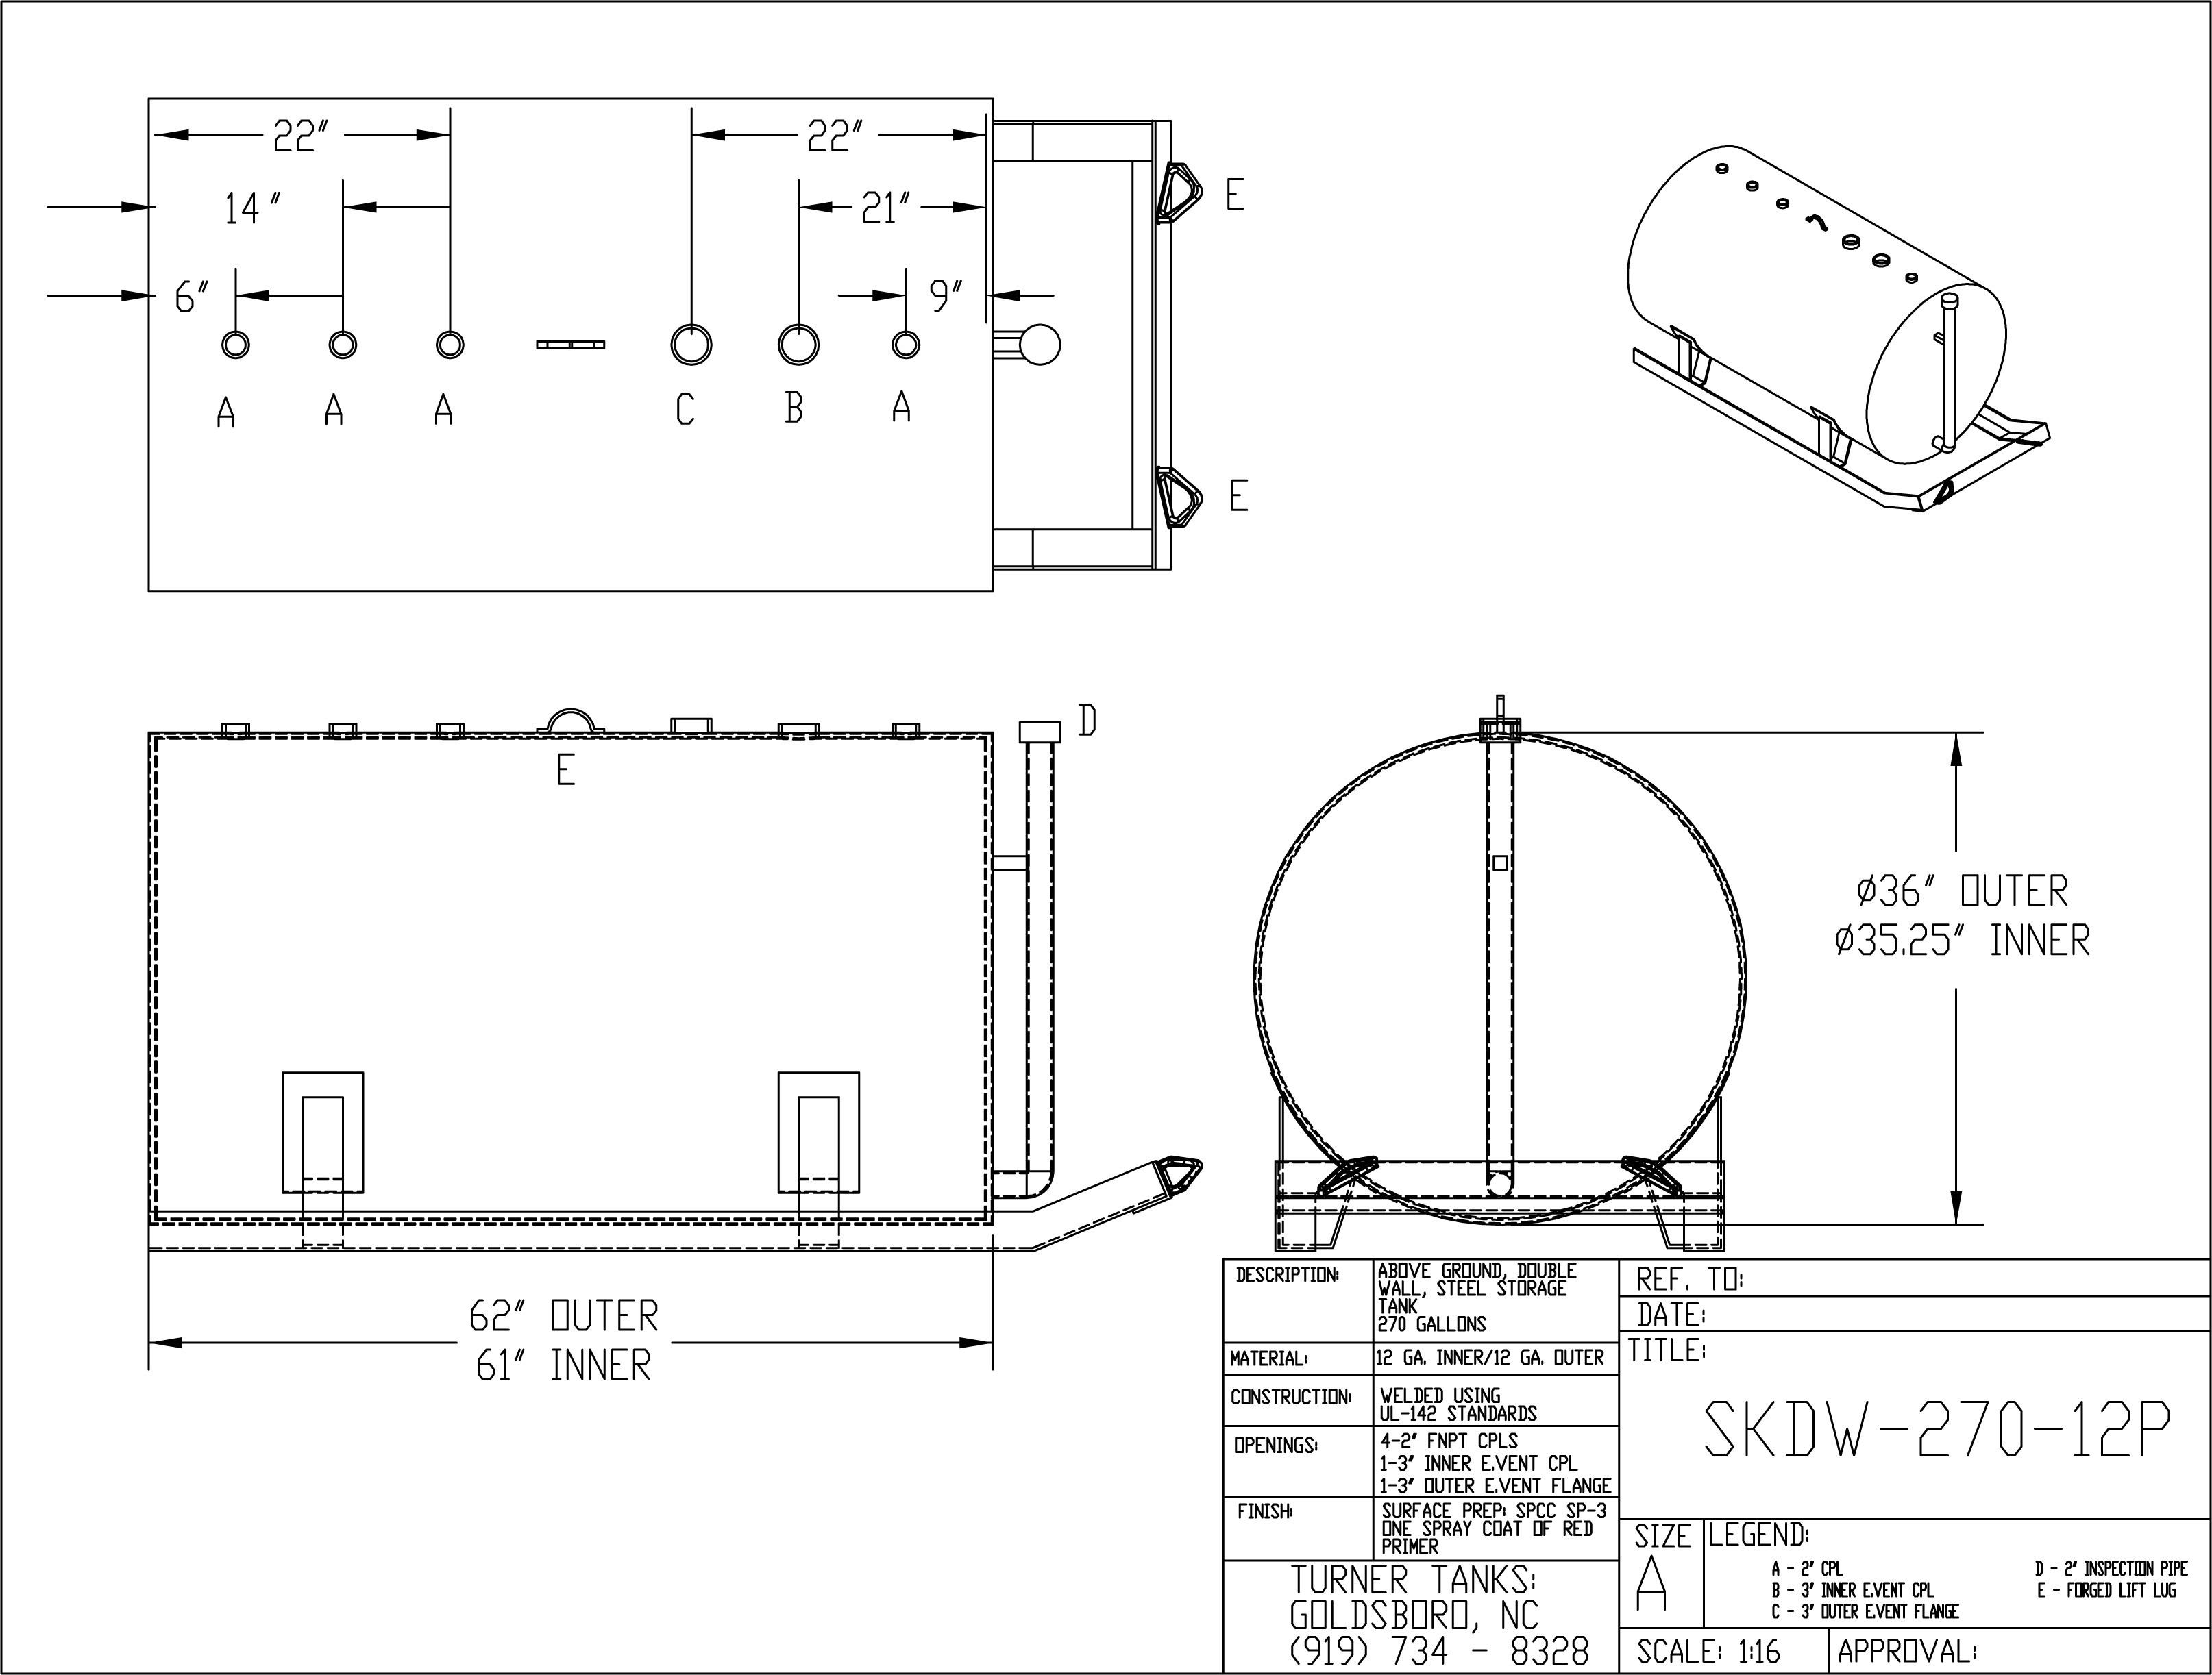 Turner Tanks Skdw 270 12p Double Wall Skid Tank 273